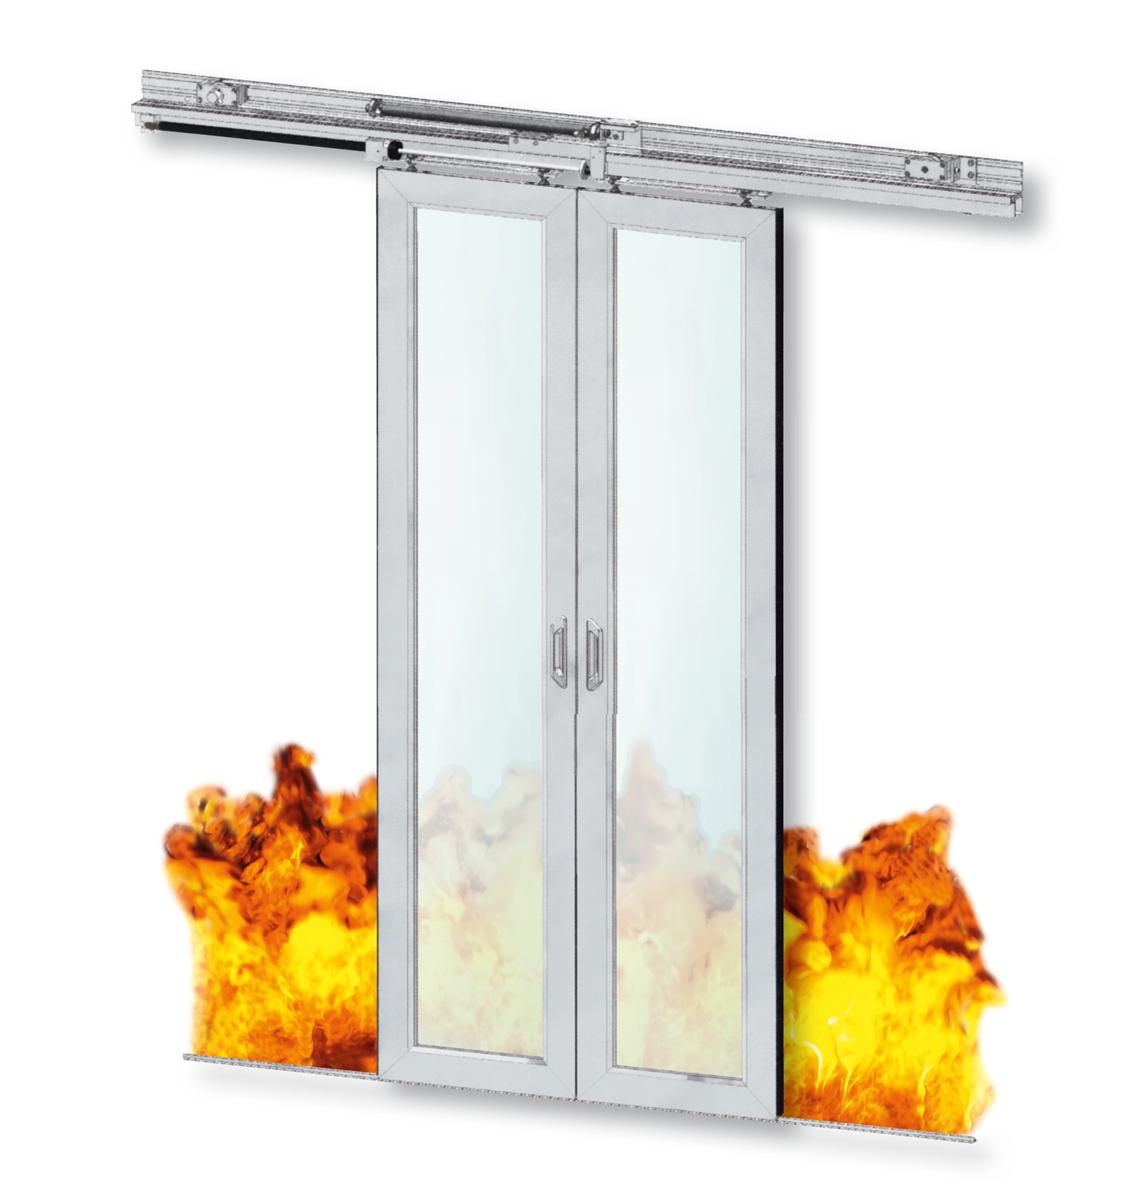 kasper elektronik | Brandschutz-Türsystem